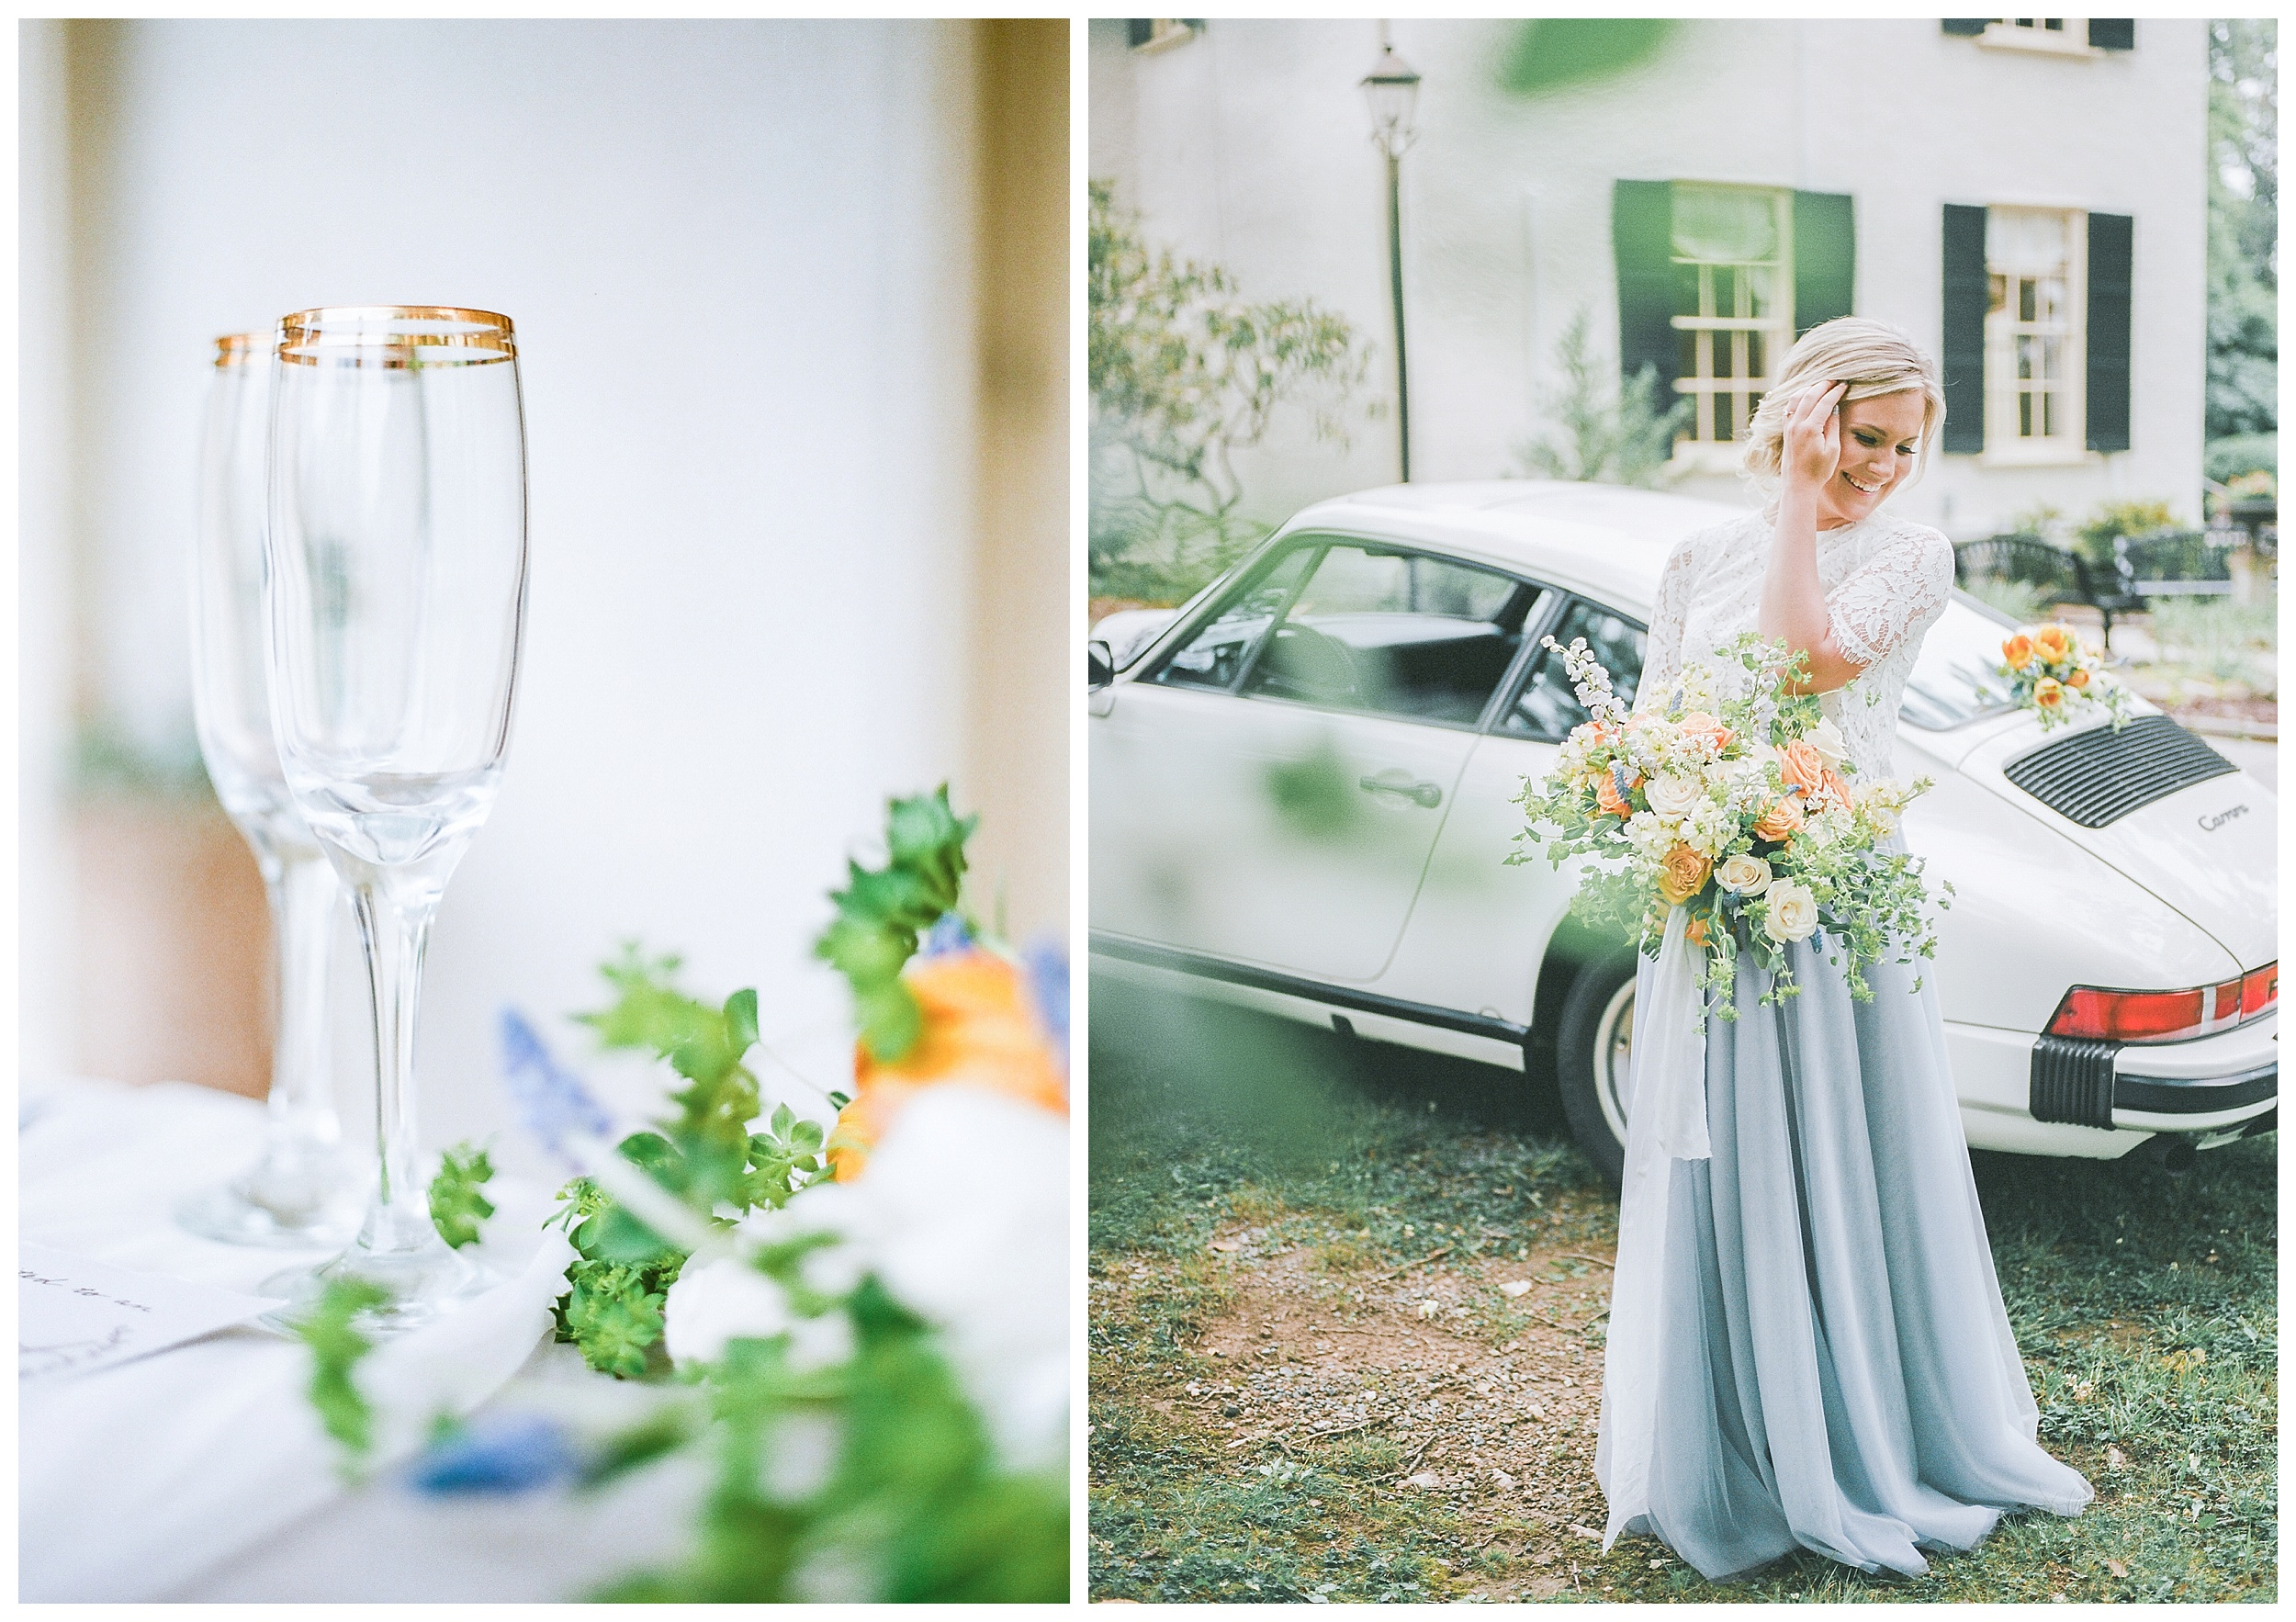 Rust Manor Wedding   Virginia Wedding Photographer Kir Tuben_0045.jpg